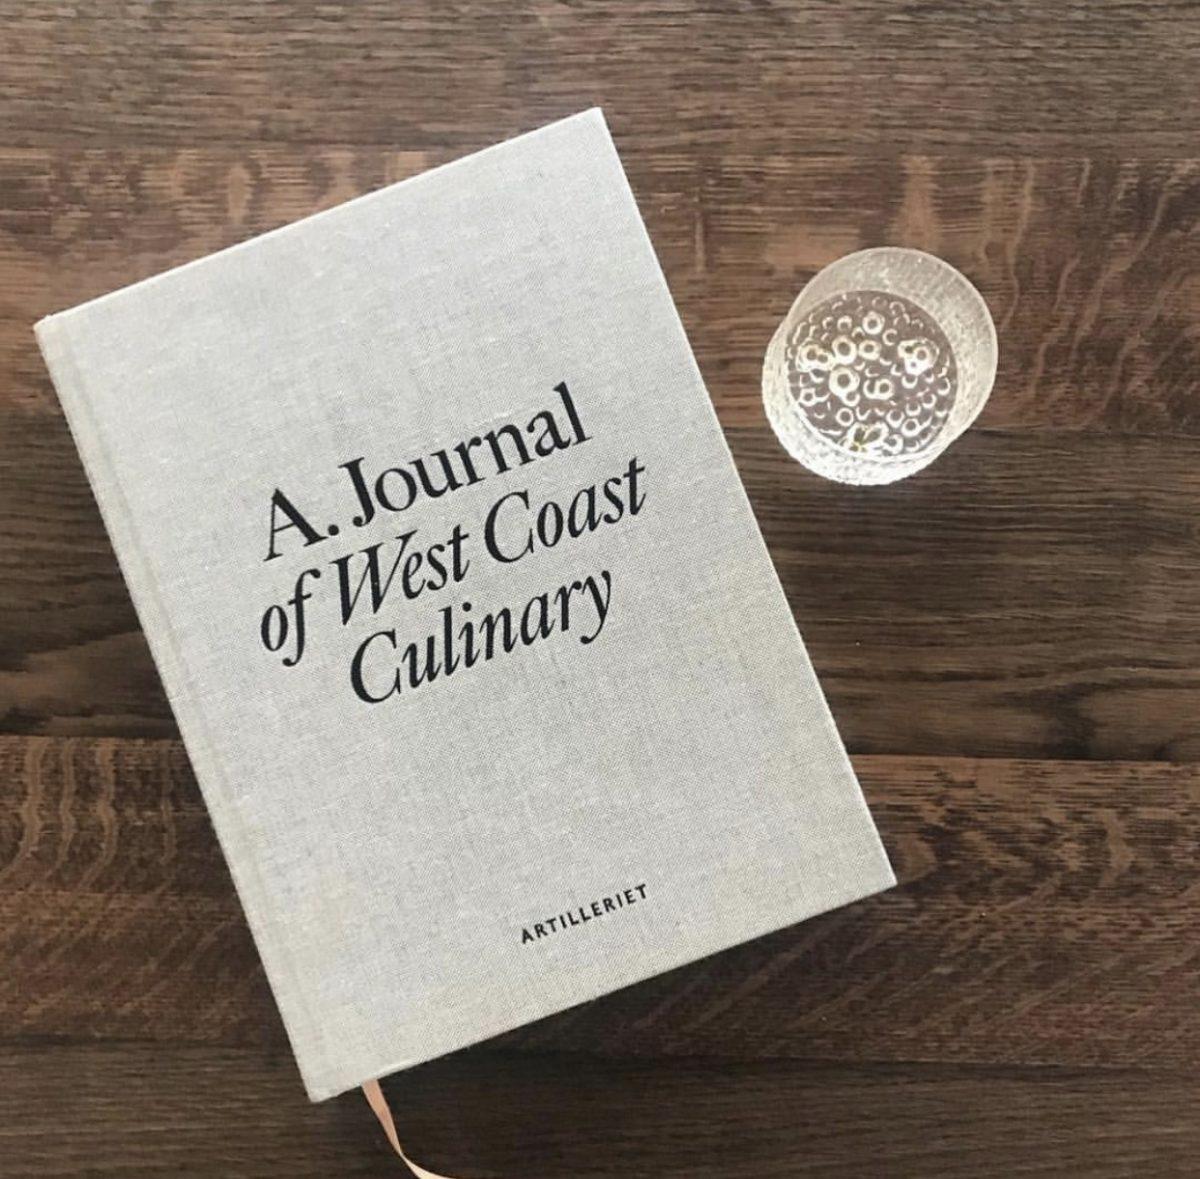 A. Journal of West Coast Culinary